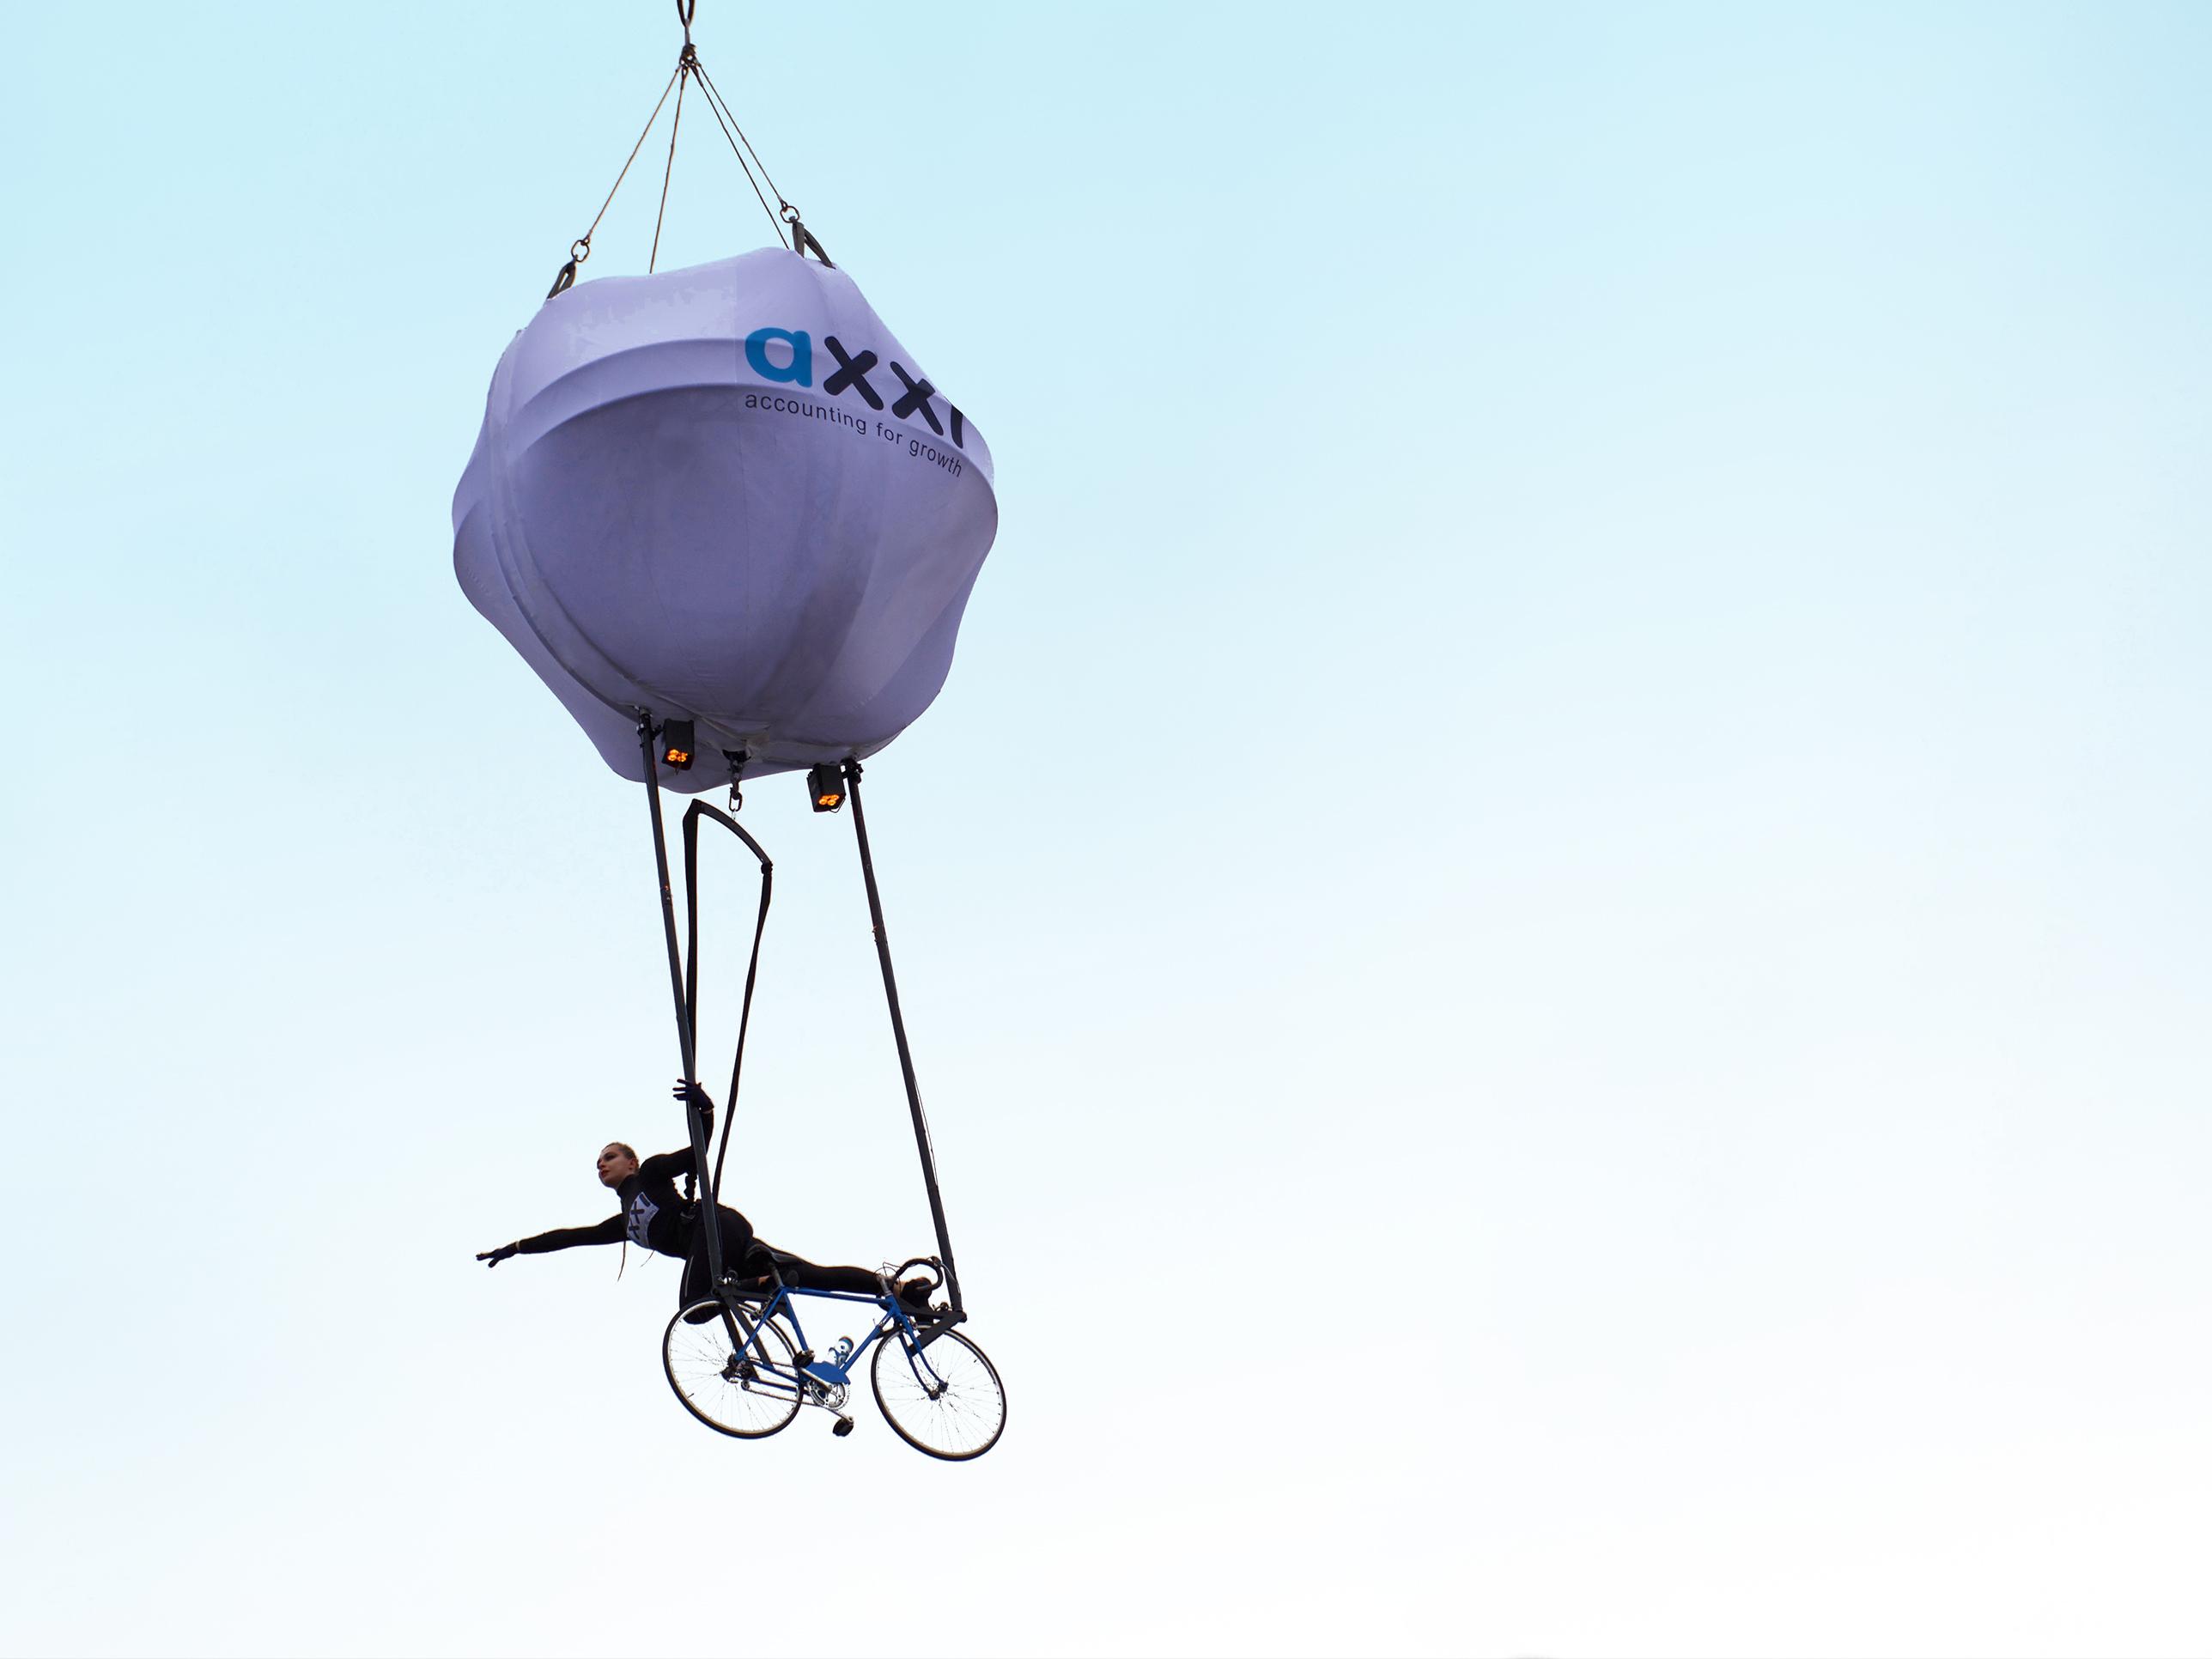 NEWA_aerial_crane_performance